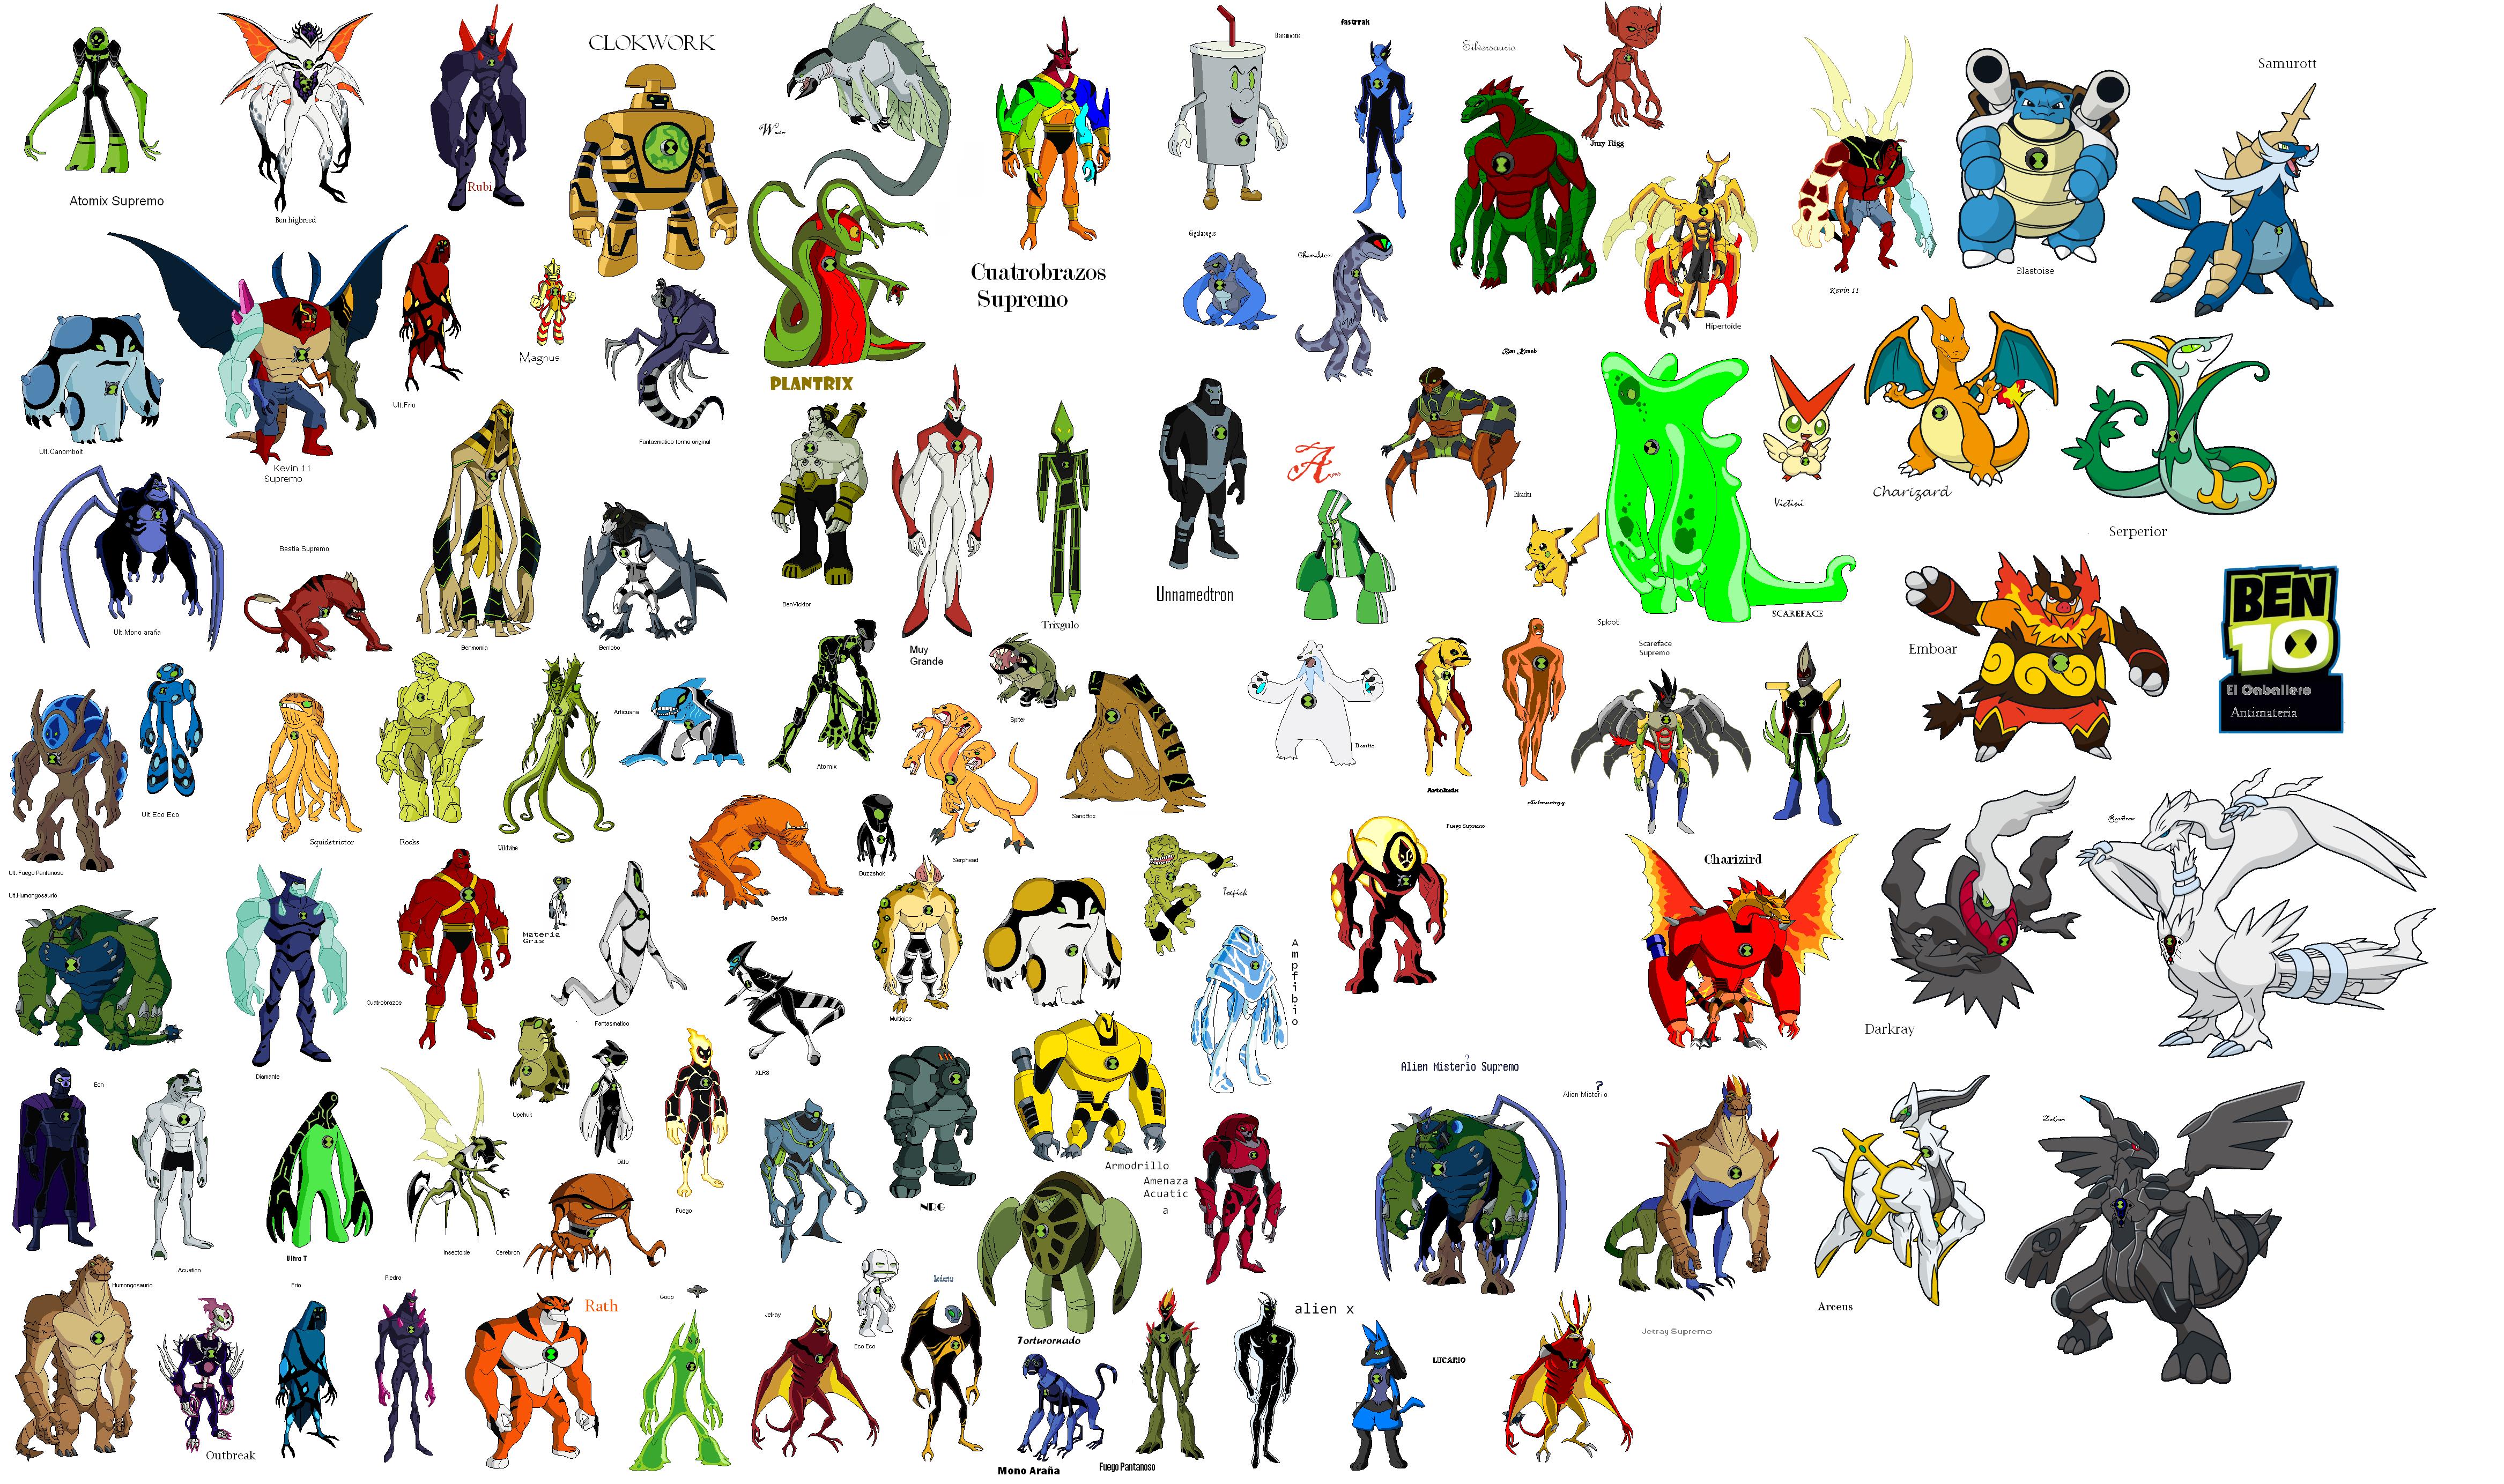 Imagen omega aliens png comunidad ben 10 fanon wiki